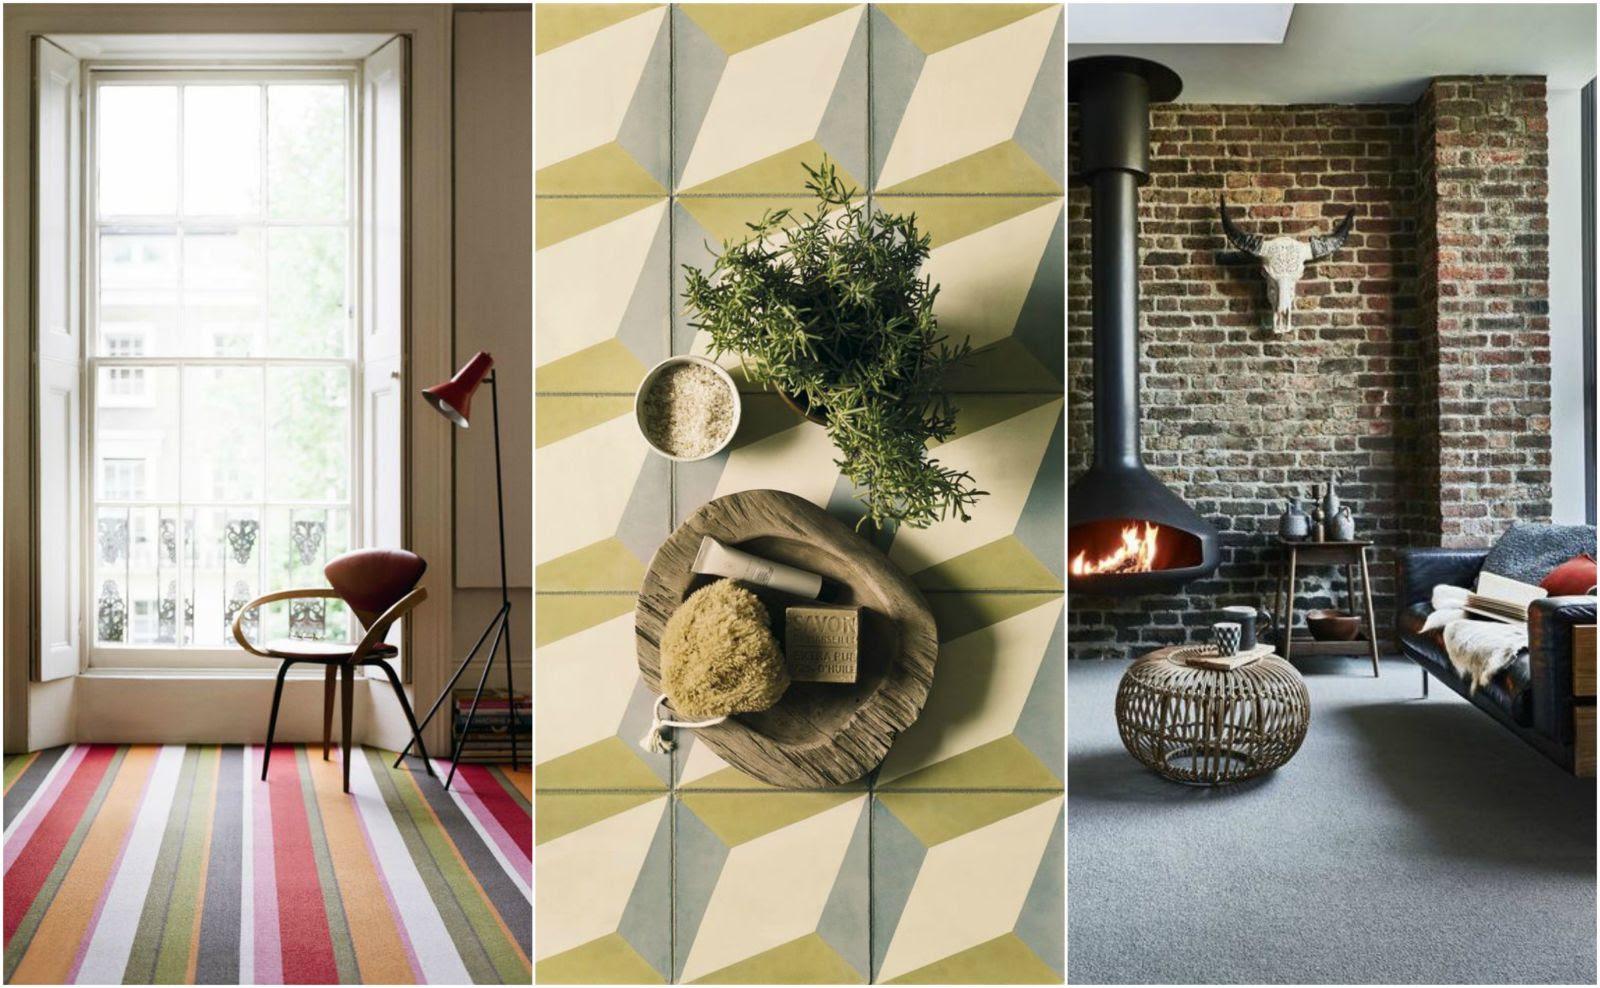 Home wallpaper trends wallpaper home for Home wallpaper trends